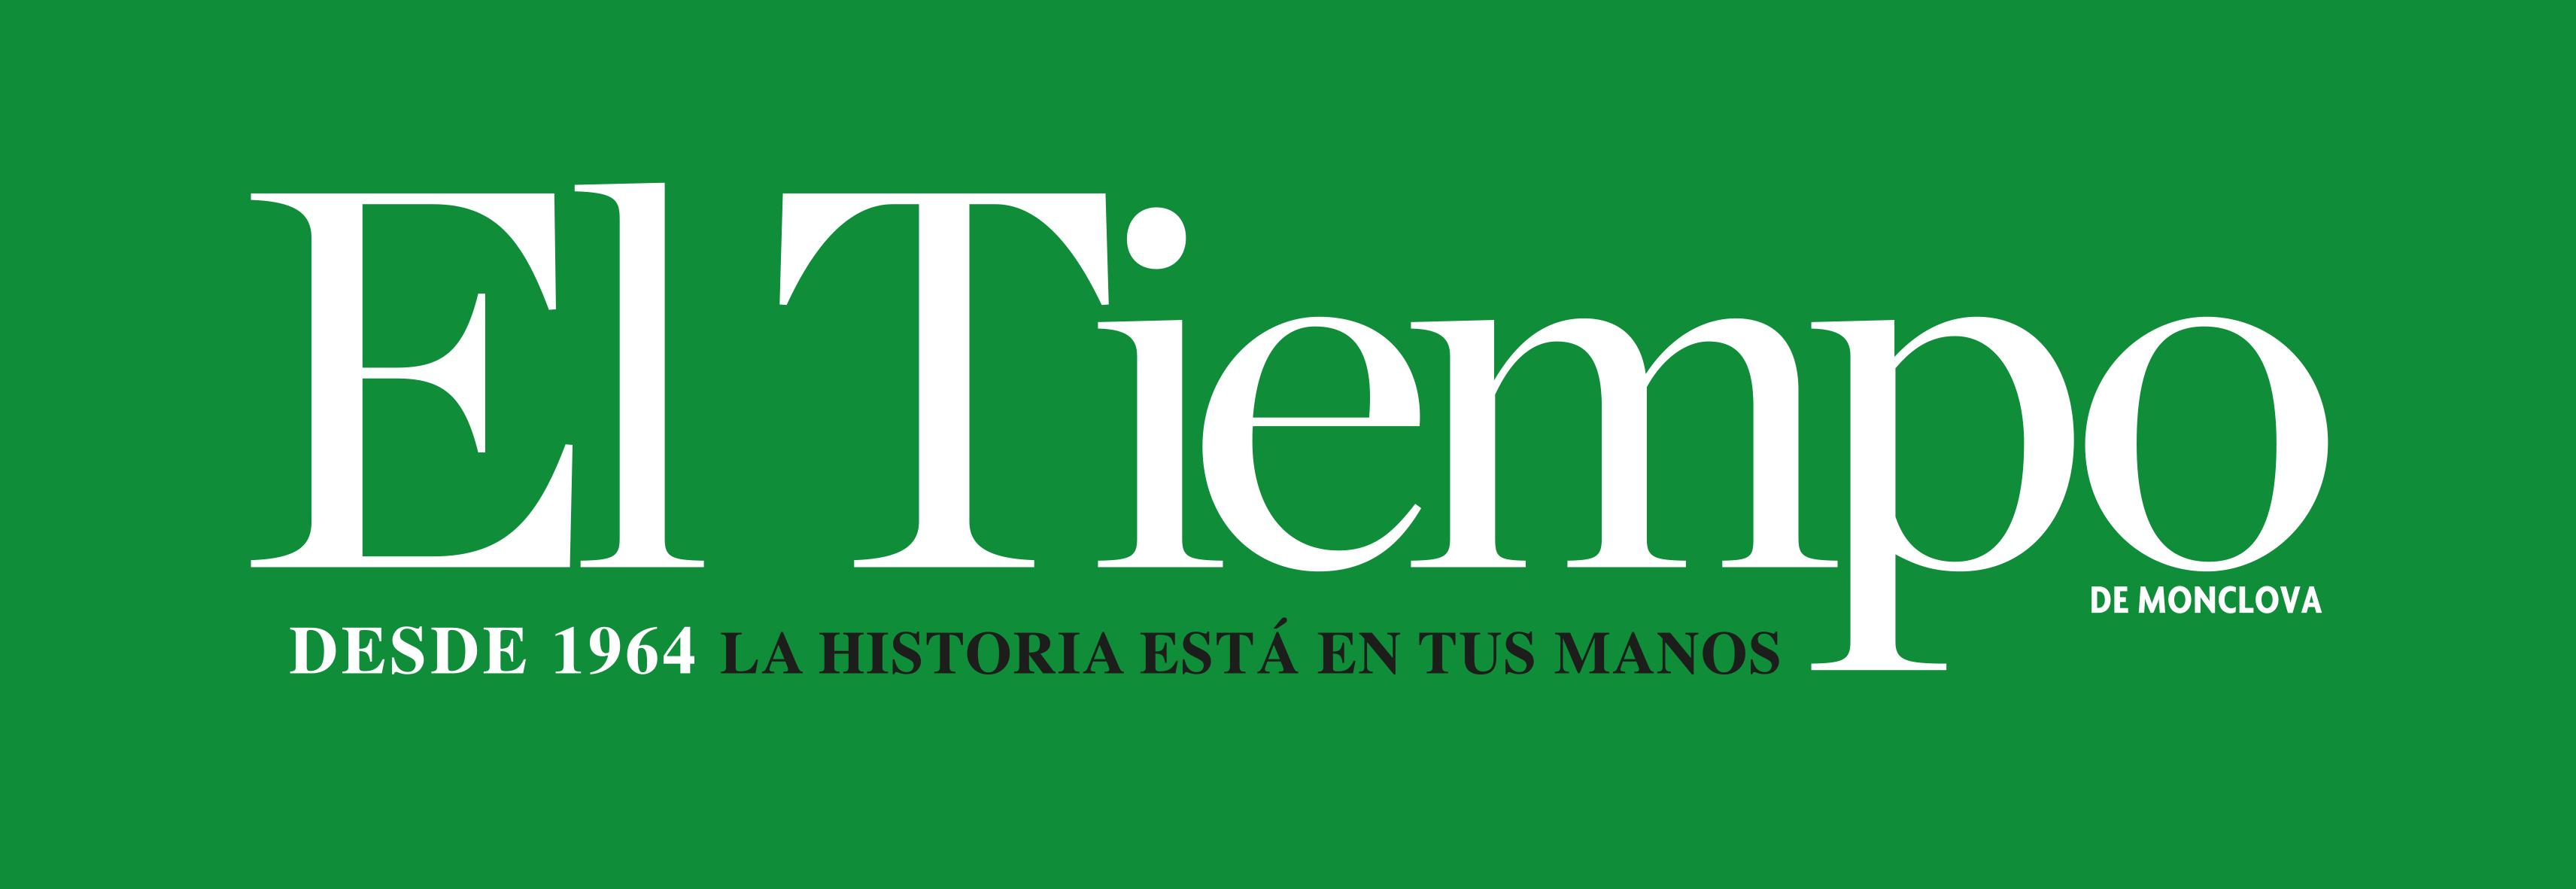 Noticias de Monclova, Coahuila. México.